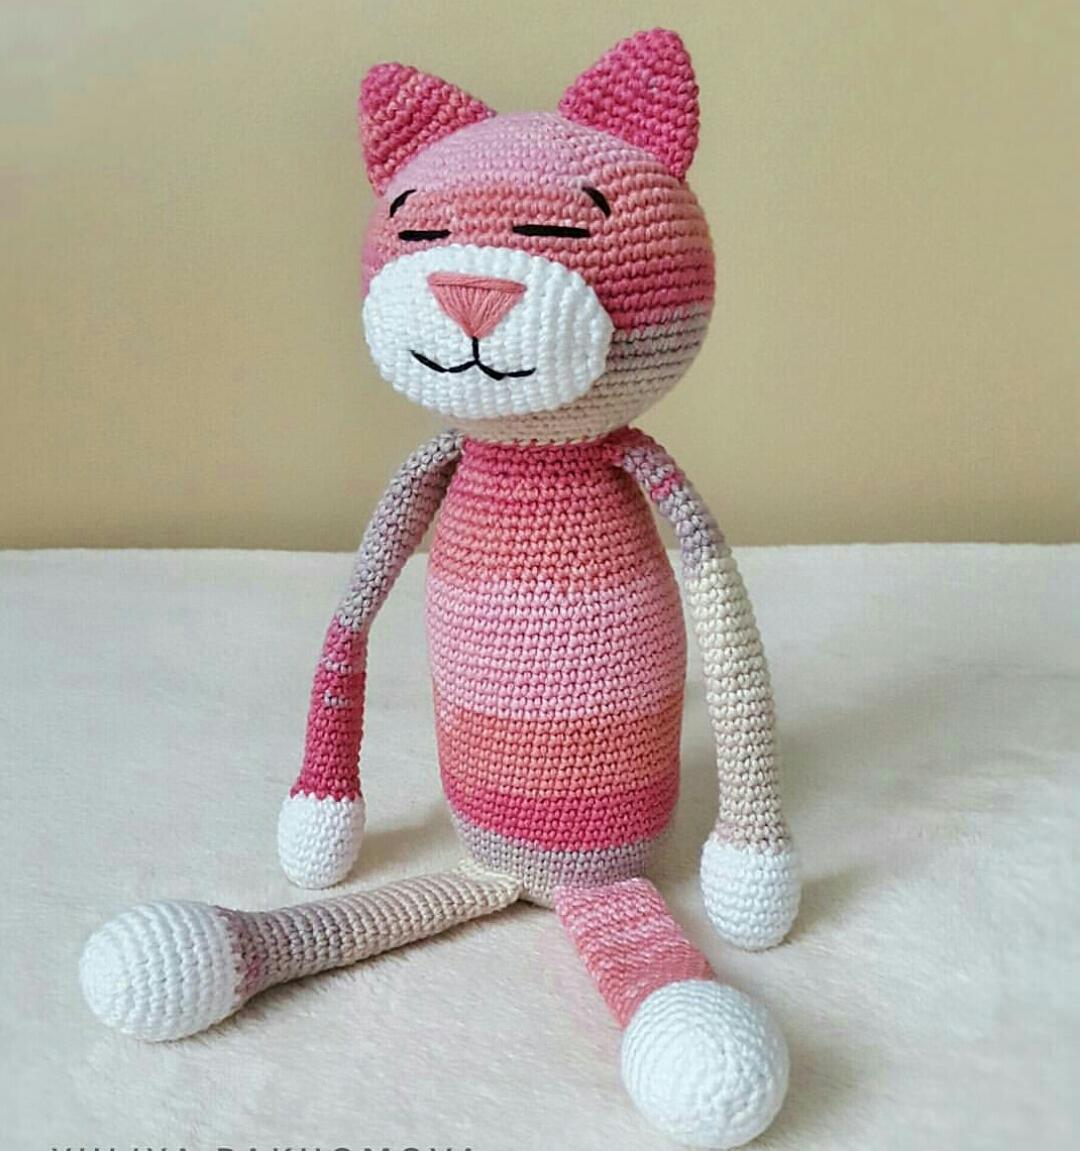 Amigurumi Uyku Arkadaşı : Amigurumi b�y�k boy uykucu kedi modeli yap l